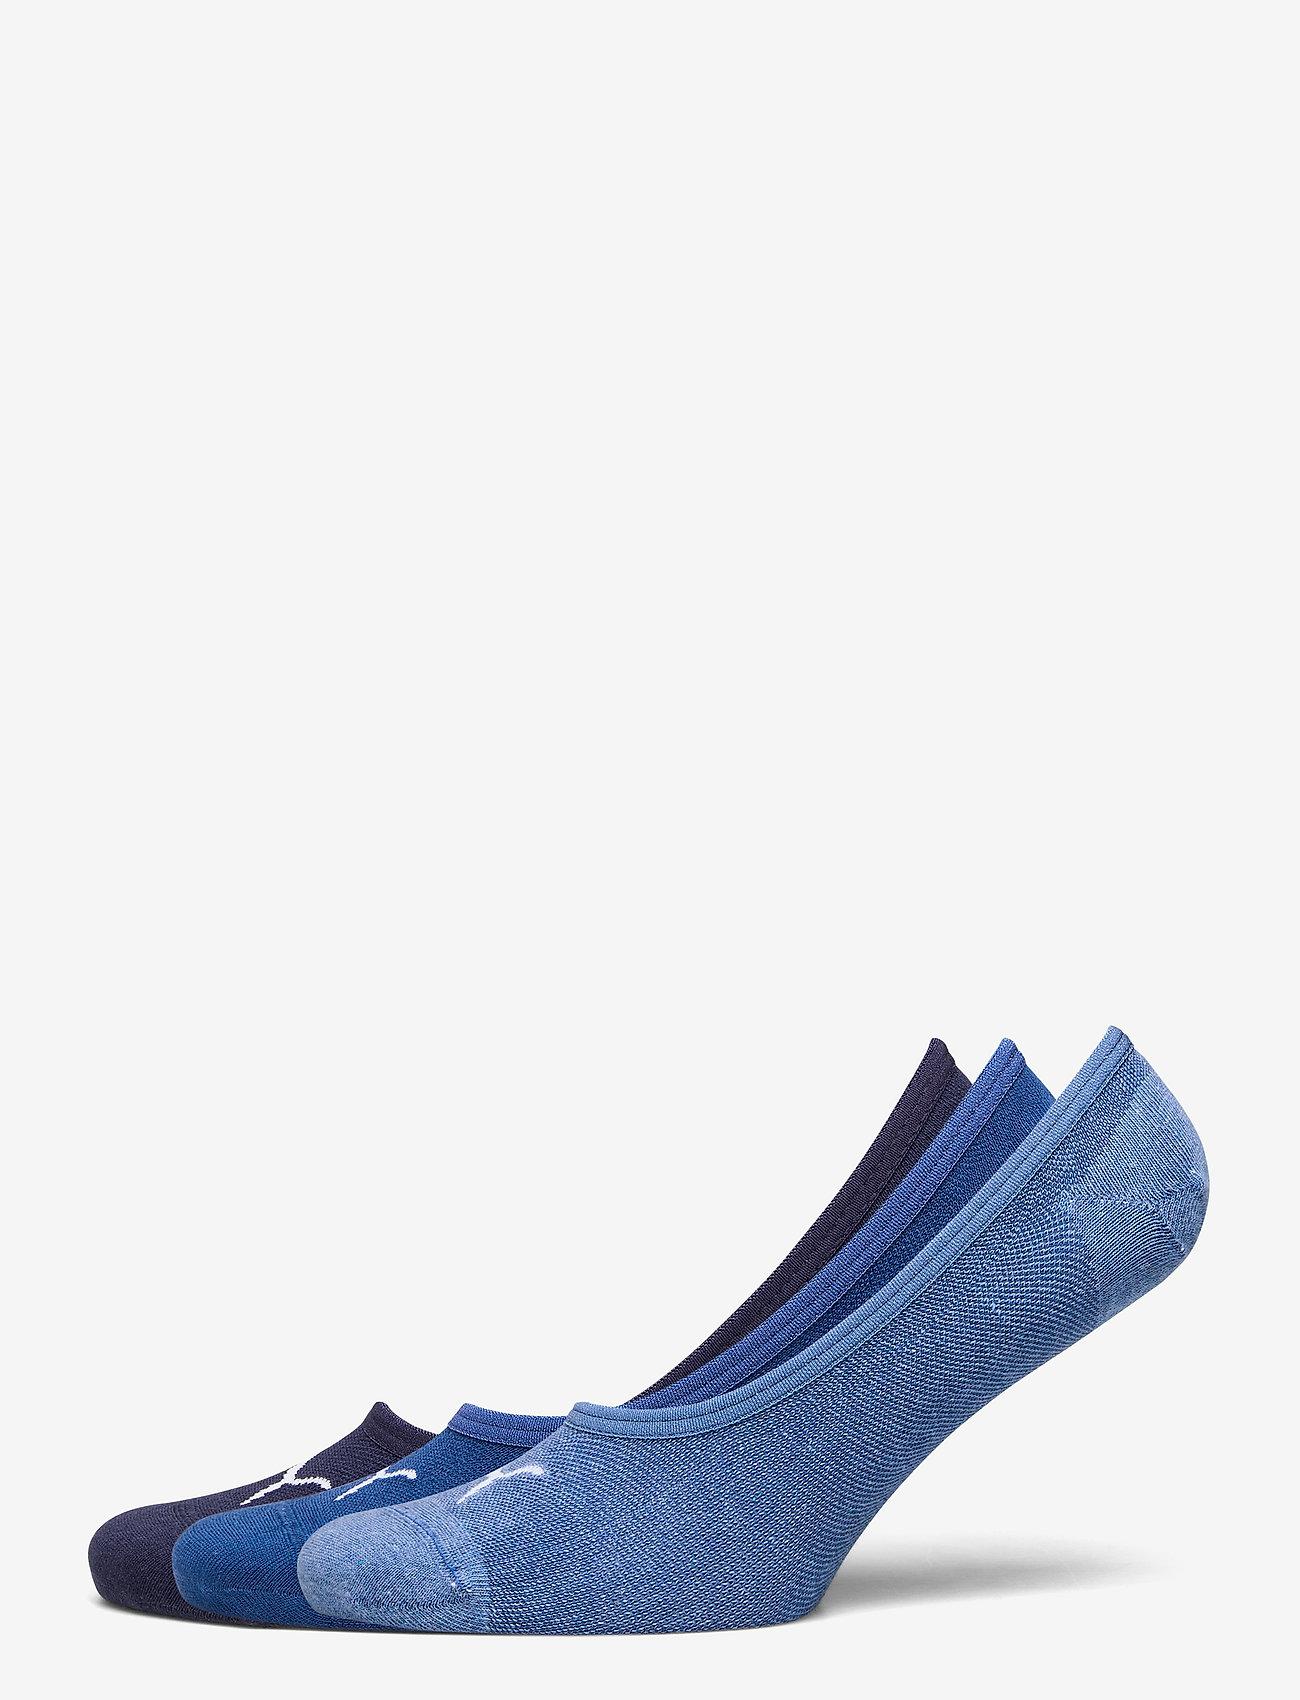 PUMA - PUMA FOOTIE 3P UNISEX - kousen - blue combo - 0